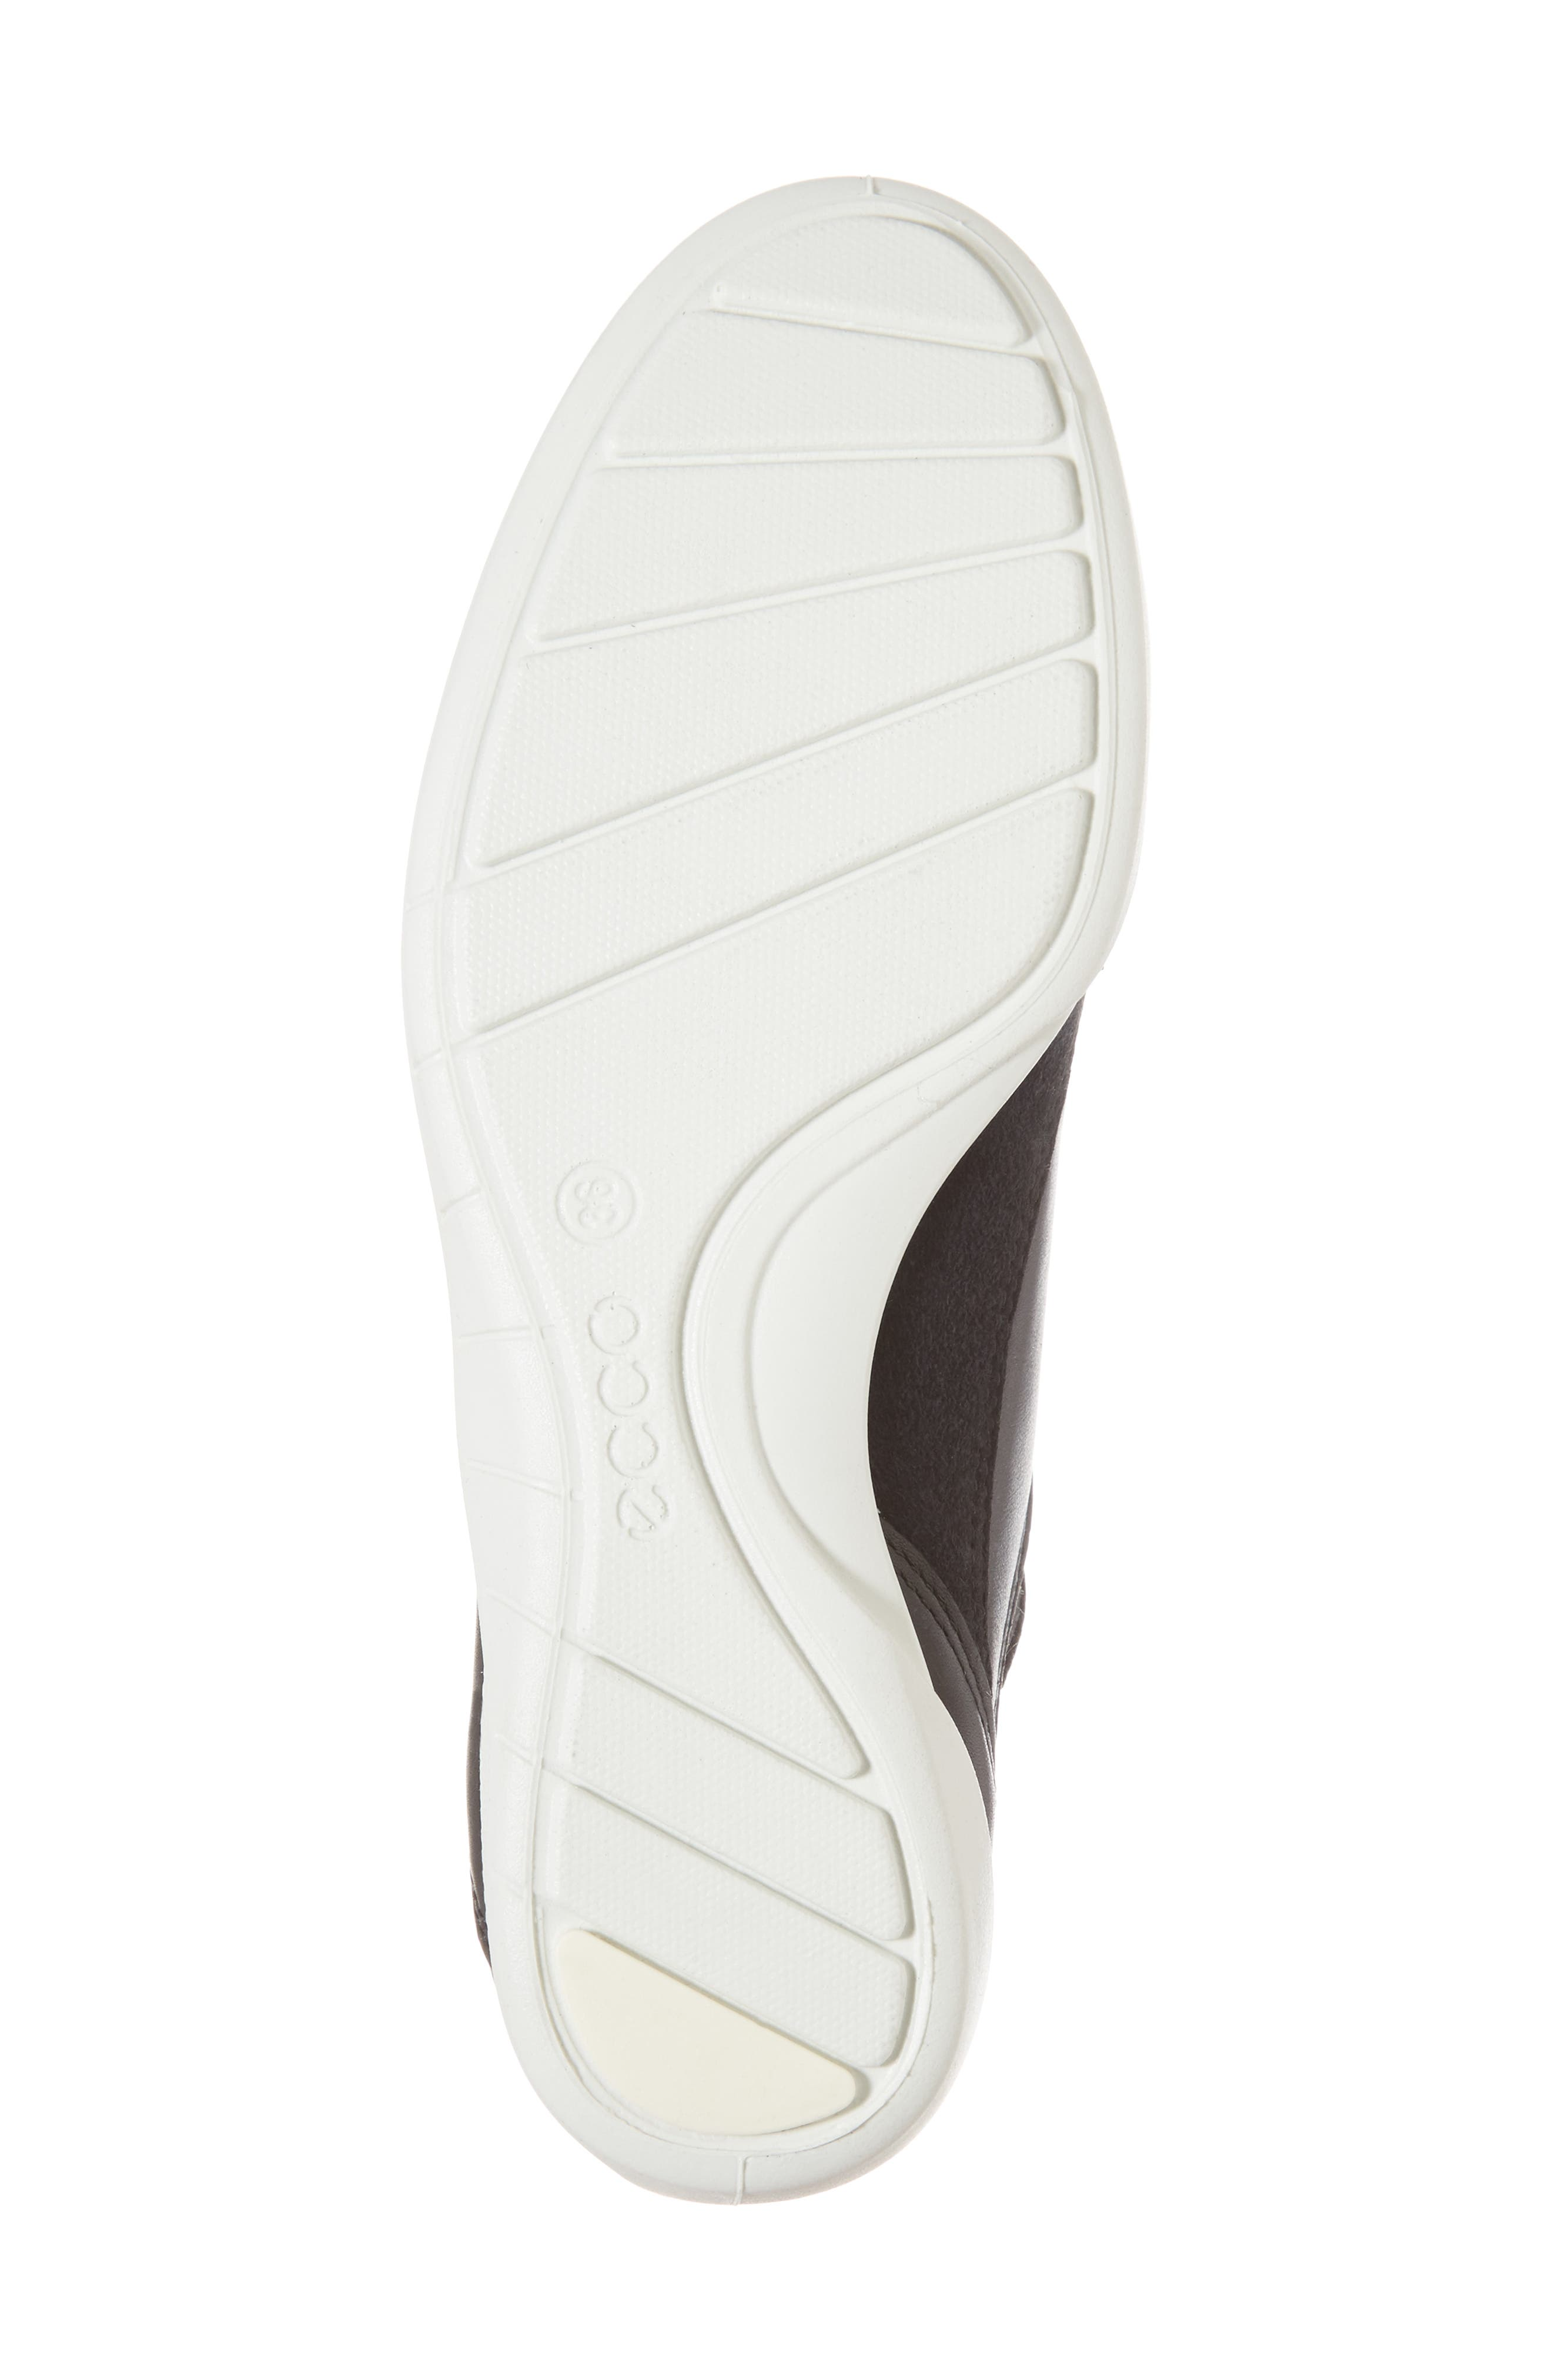 Bluma Speedlace Sneaker,                             Alternate thumbnail 6, color,                             001